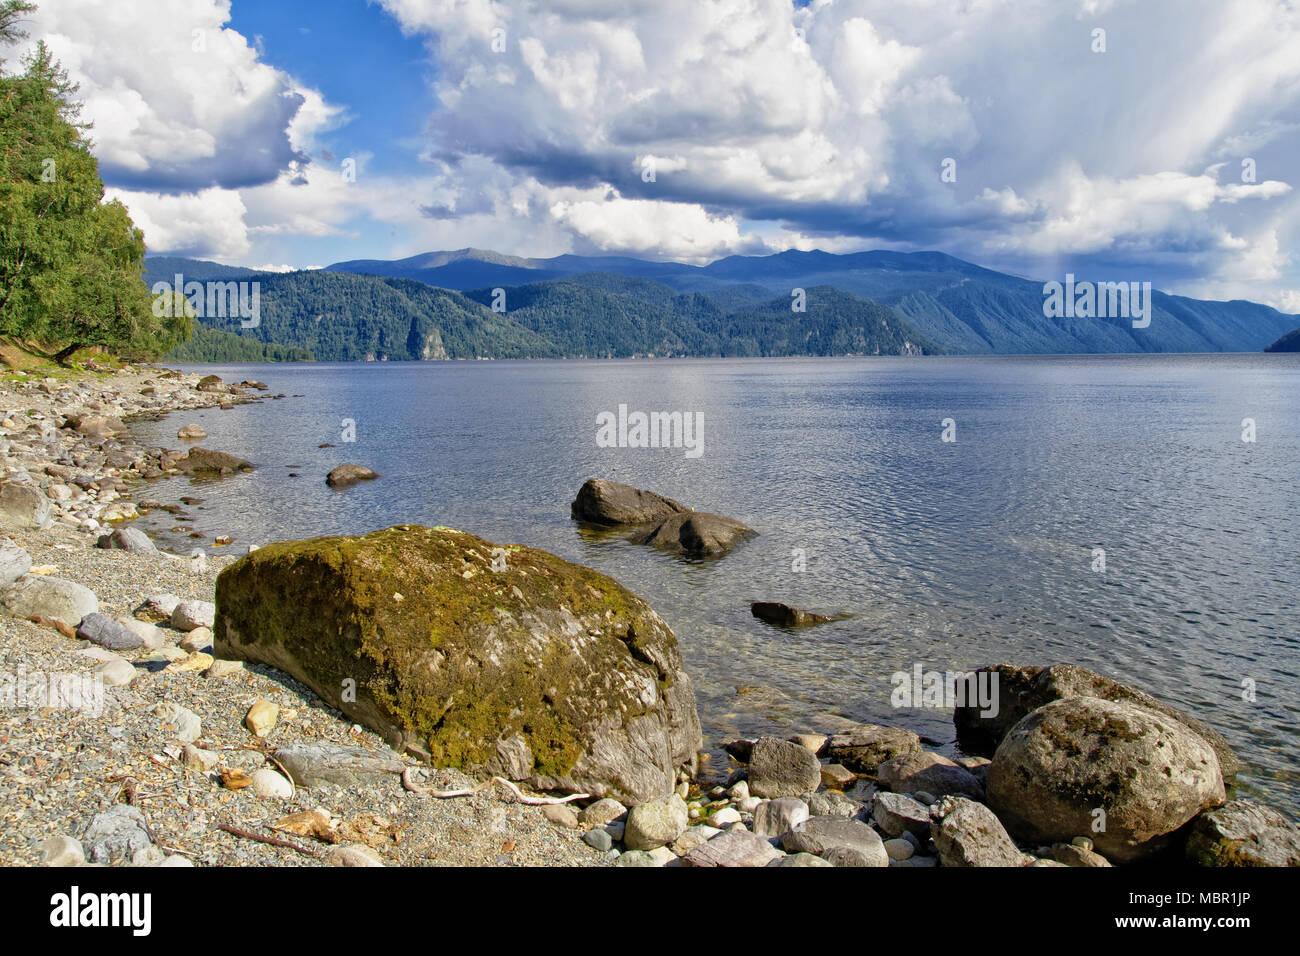 Teletskoye lake, Siberia. View of the natural Bay on the right Bank Stock Photo